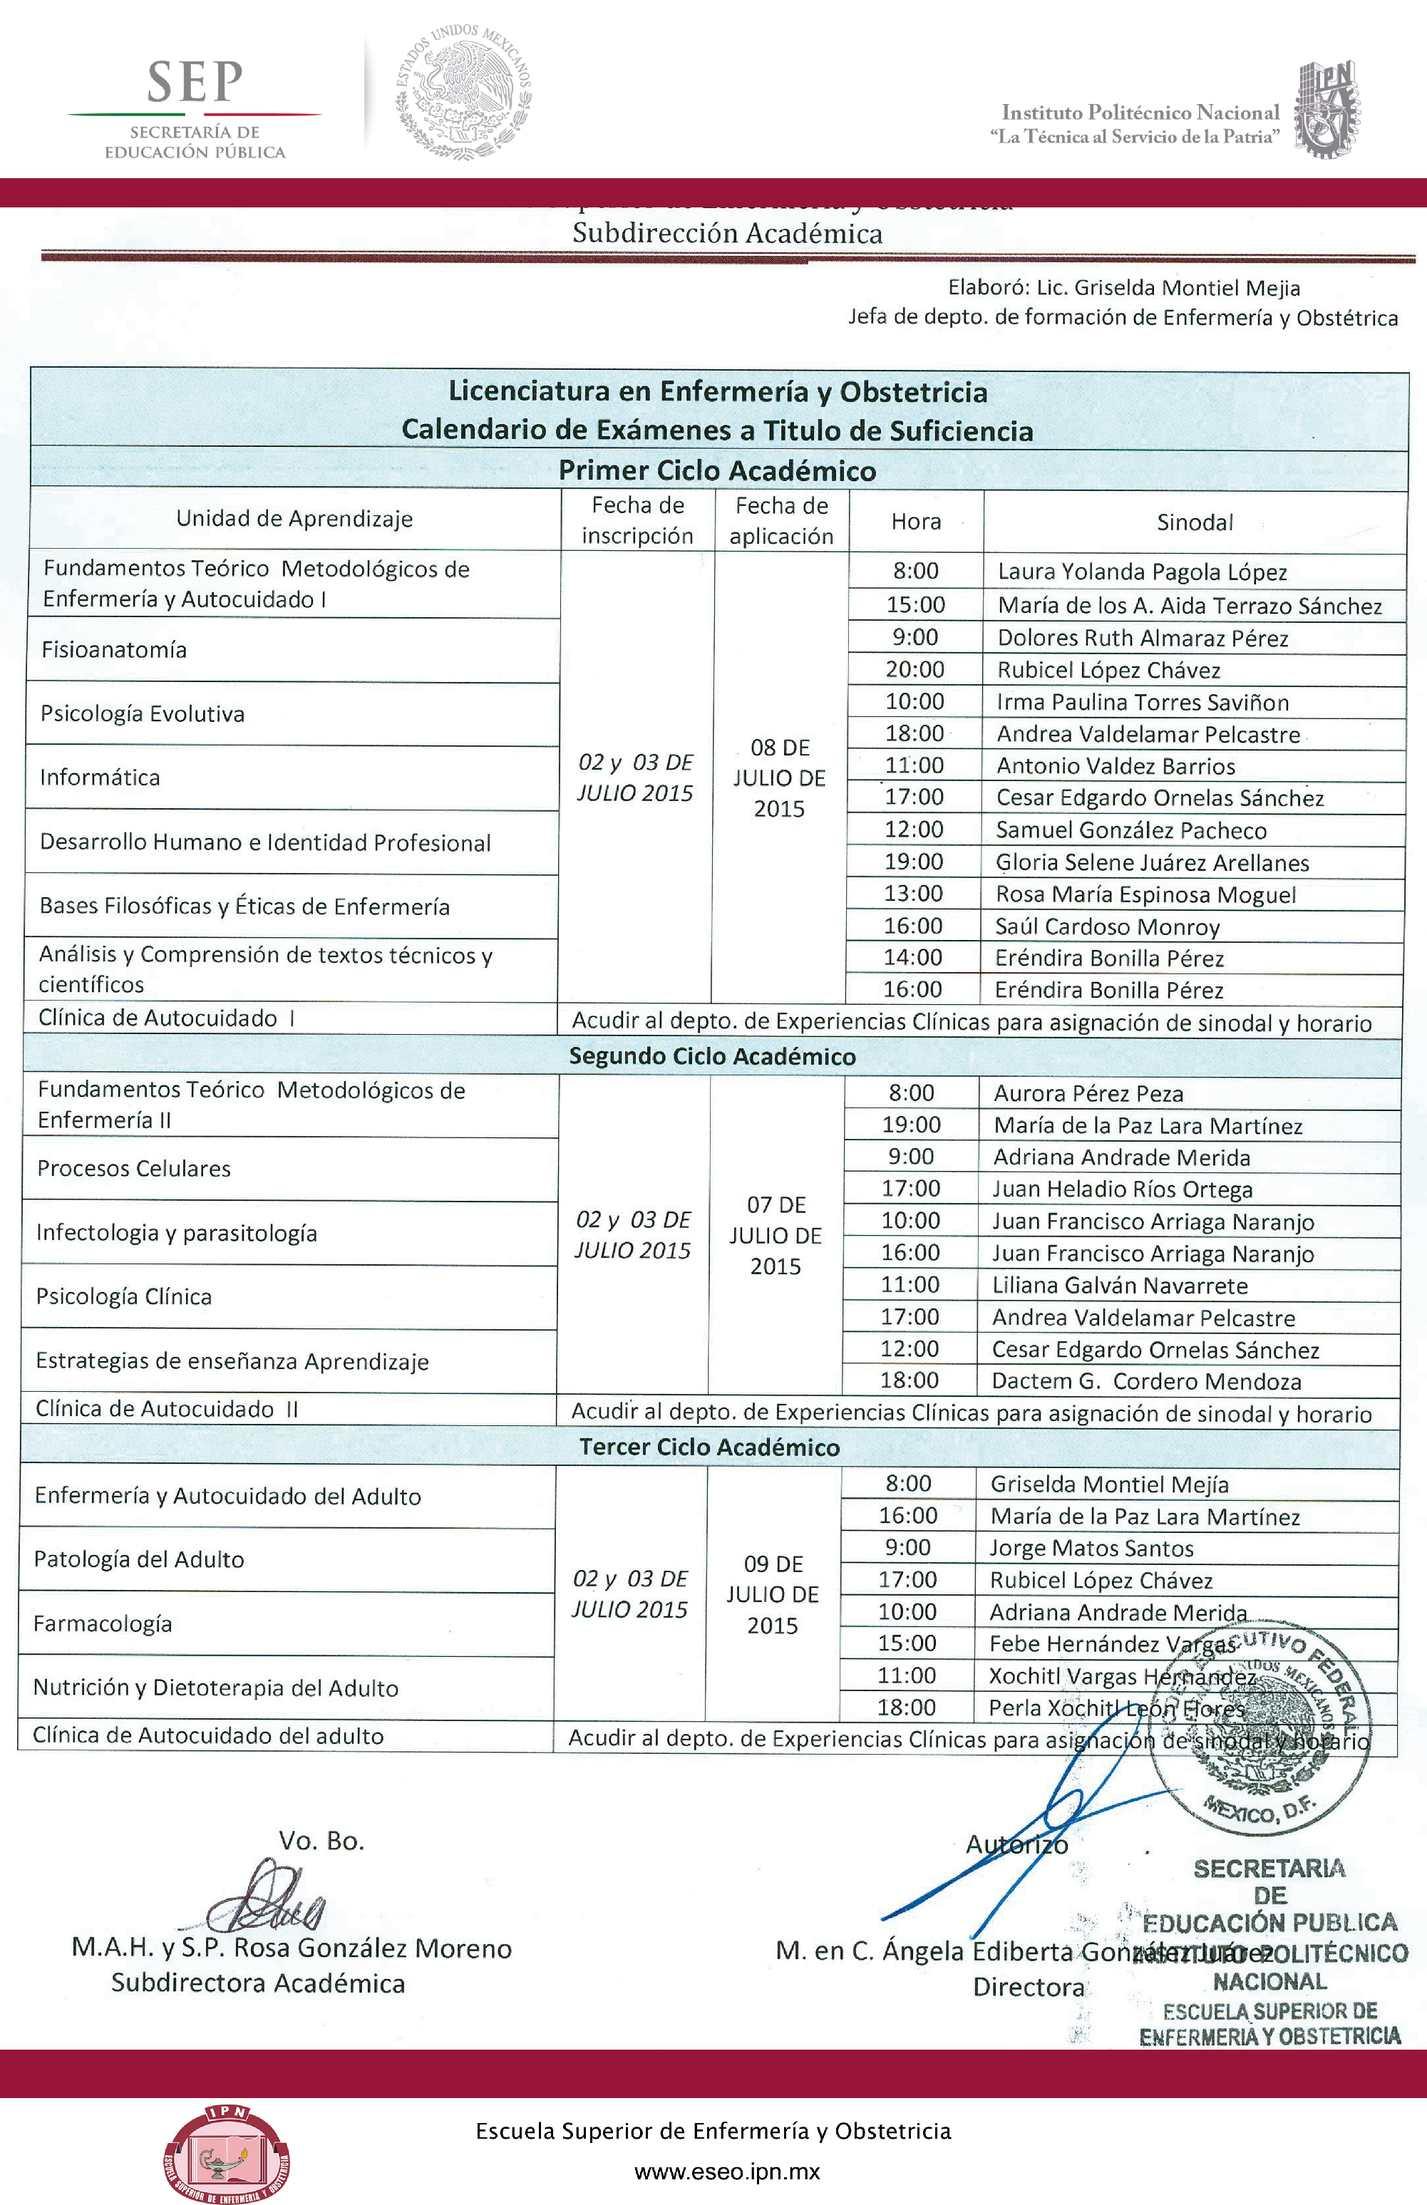 Calendario Politecnico.Calameo Calendario 15 Leo